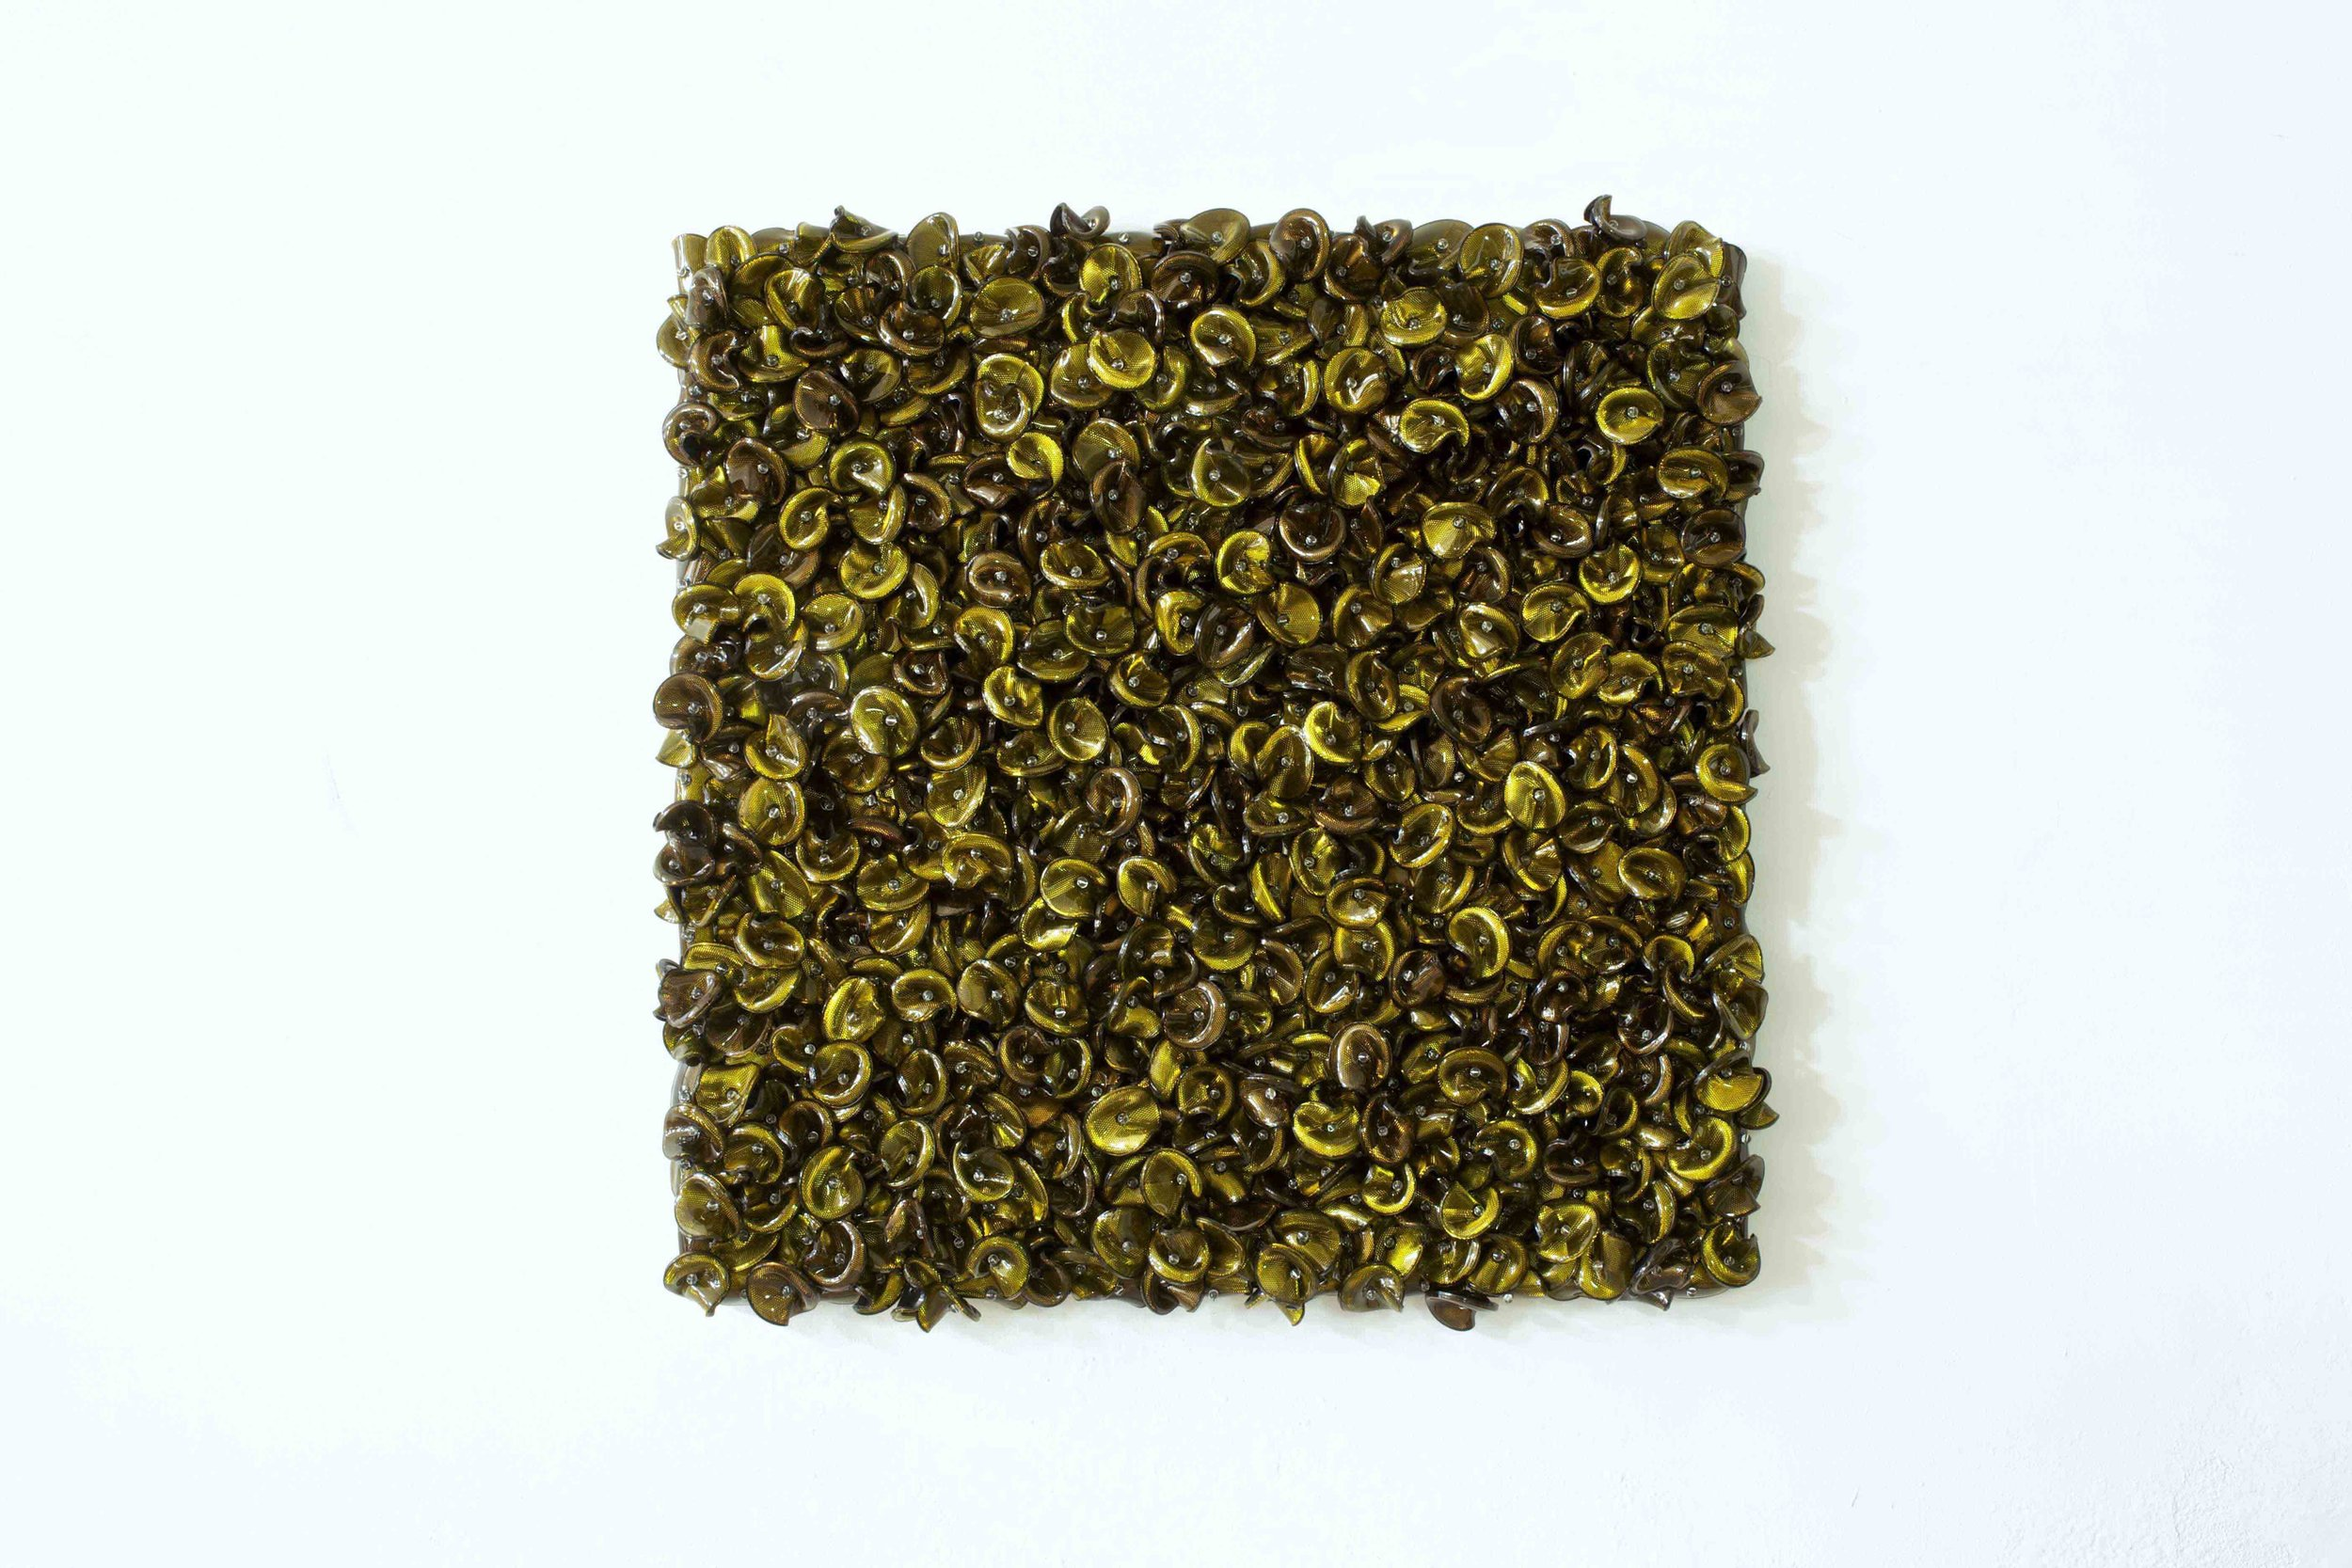 DANI MARTI   Vert sobre Vert  2017 115 x 115 x 11 cm  Customise corner cube reflectors, glass beads on powder coated aluminium, frame